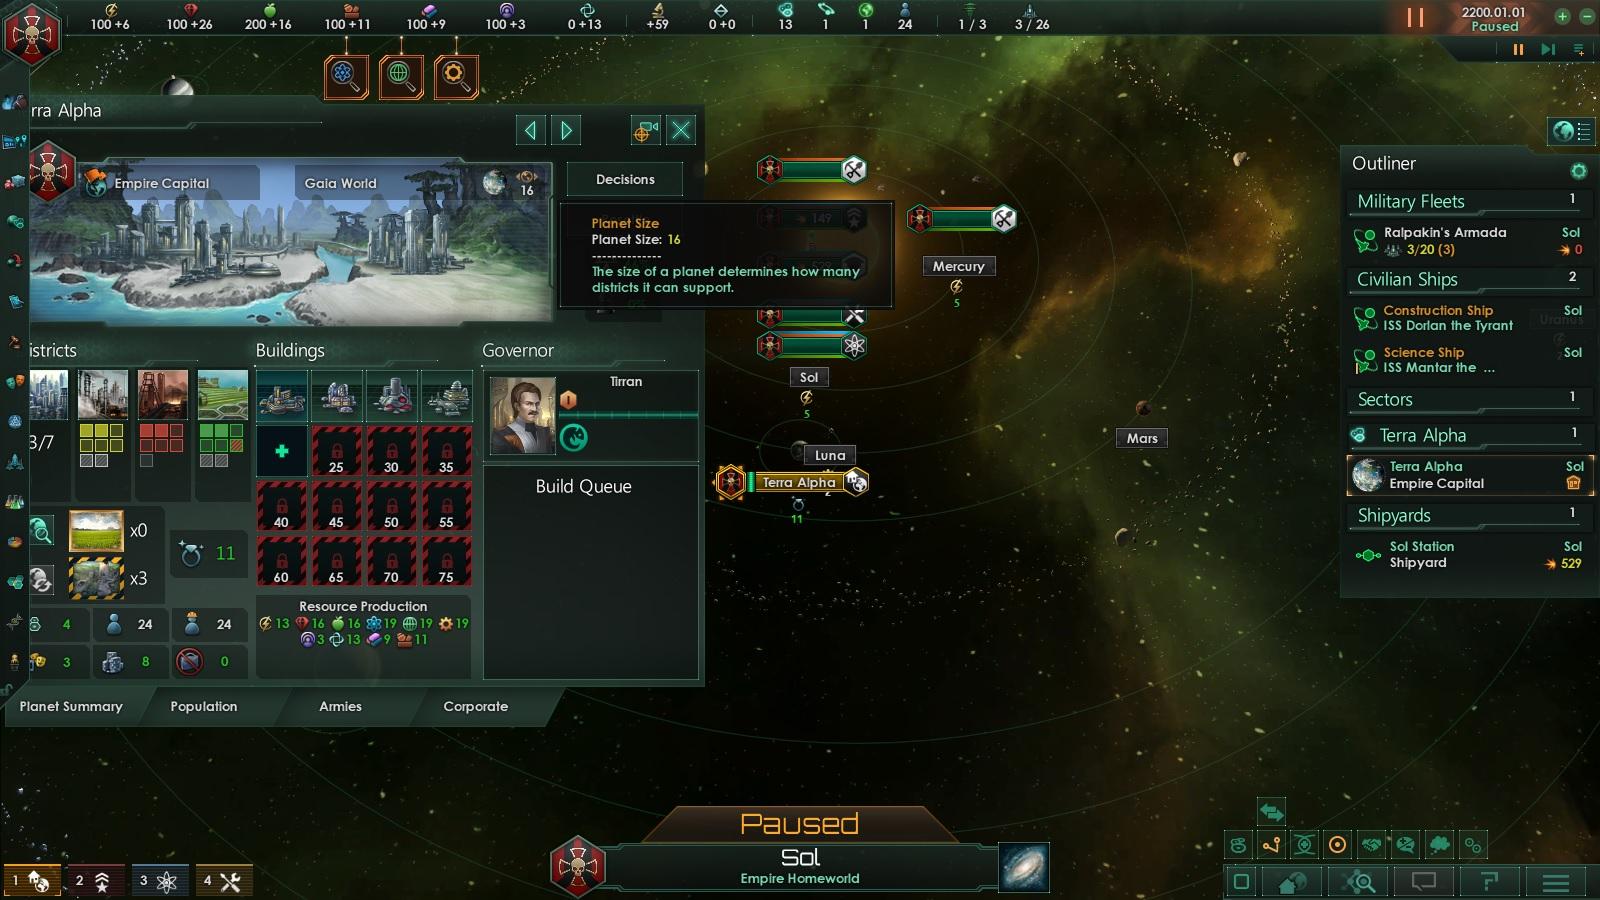 2 2 Le Guin bug / glitches megathread | Paradox Interactive